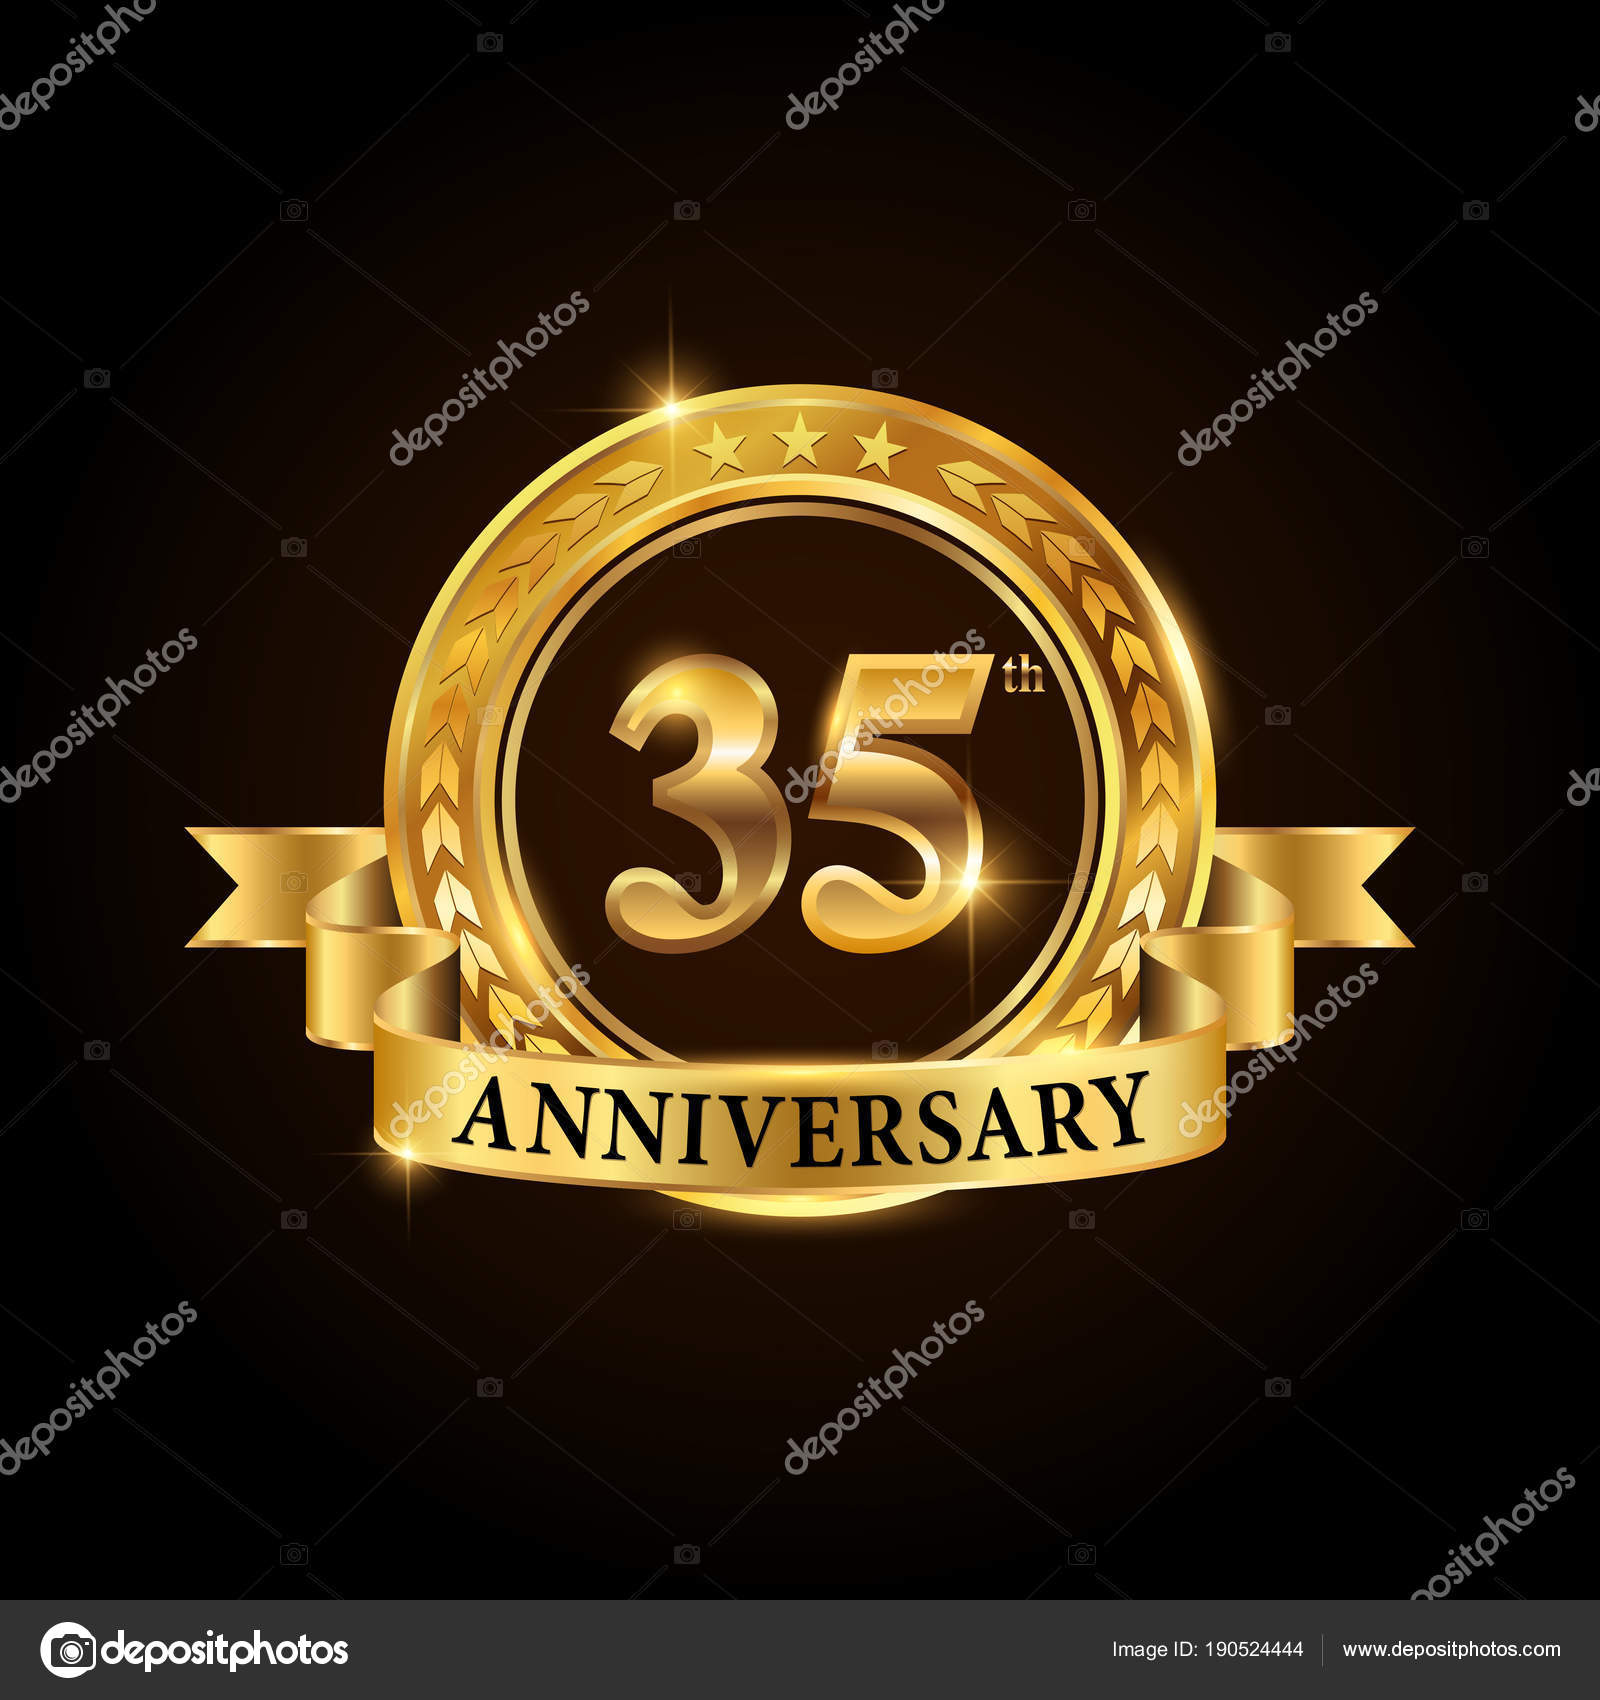 35 Years Anniversary Celebration Logotype Golden Anniversary Emblem